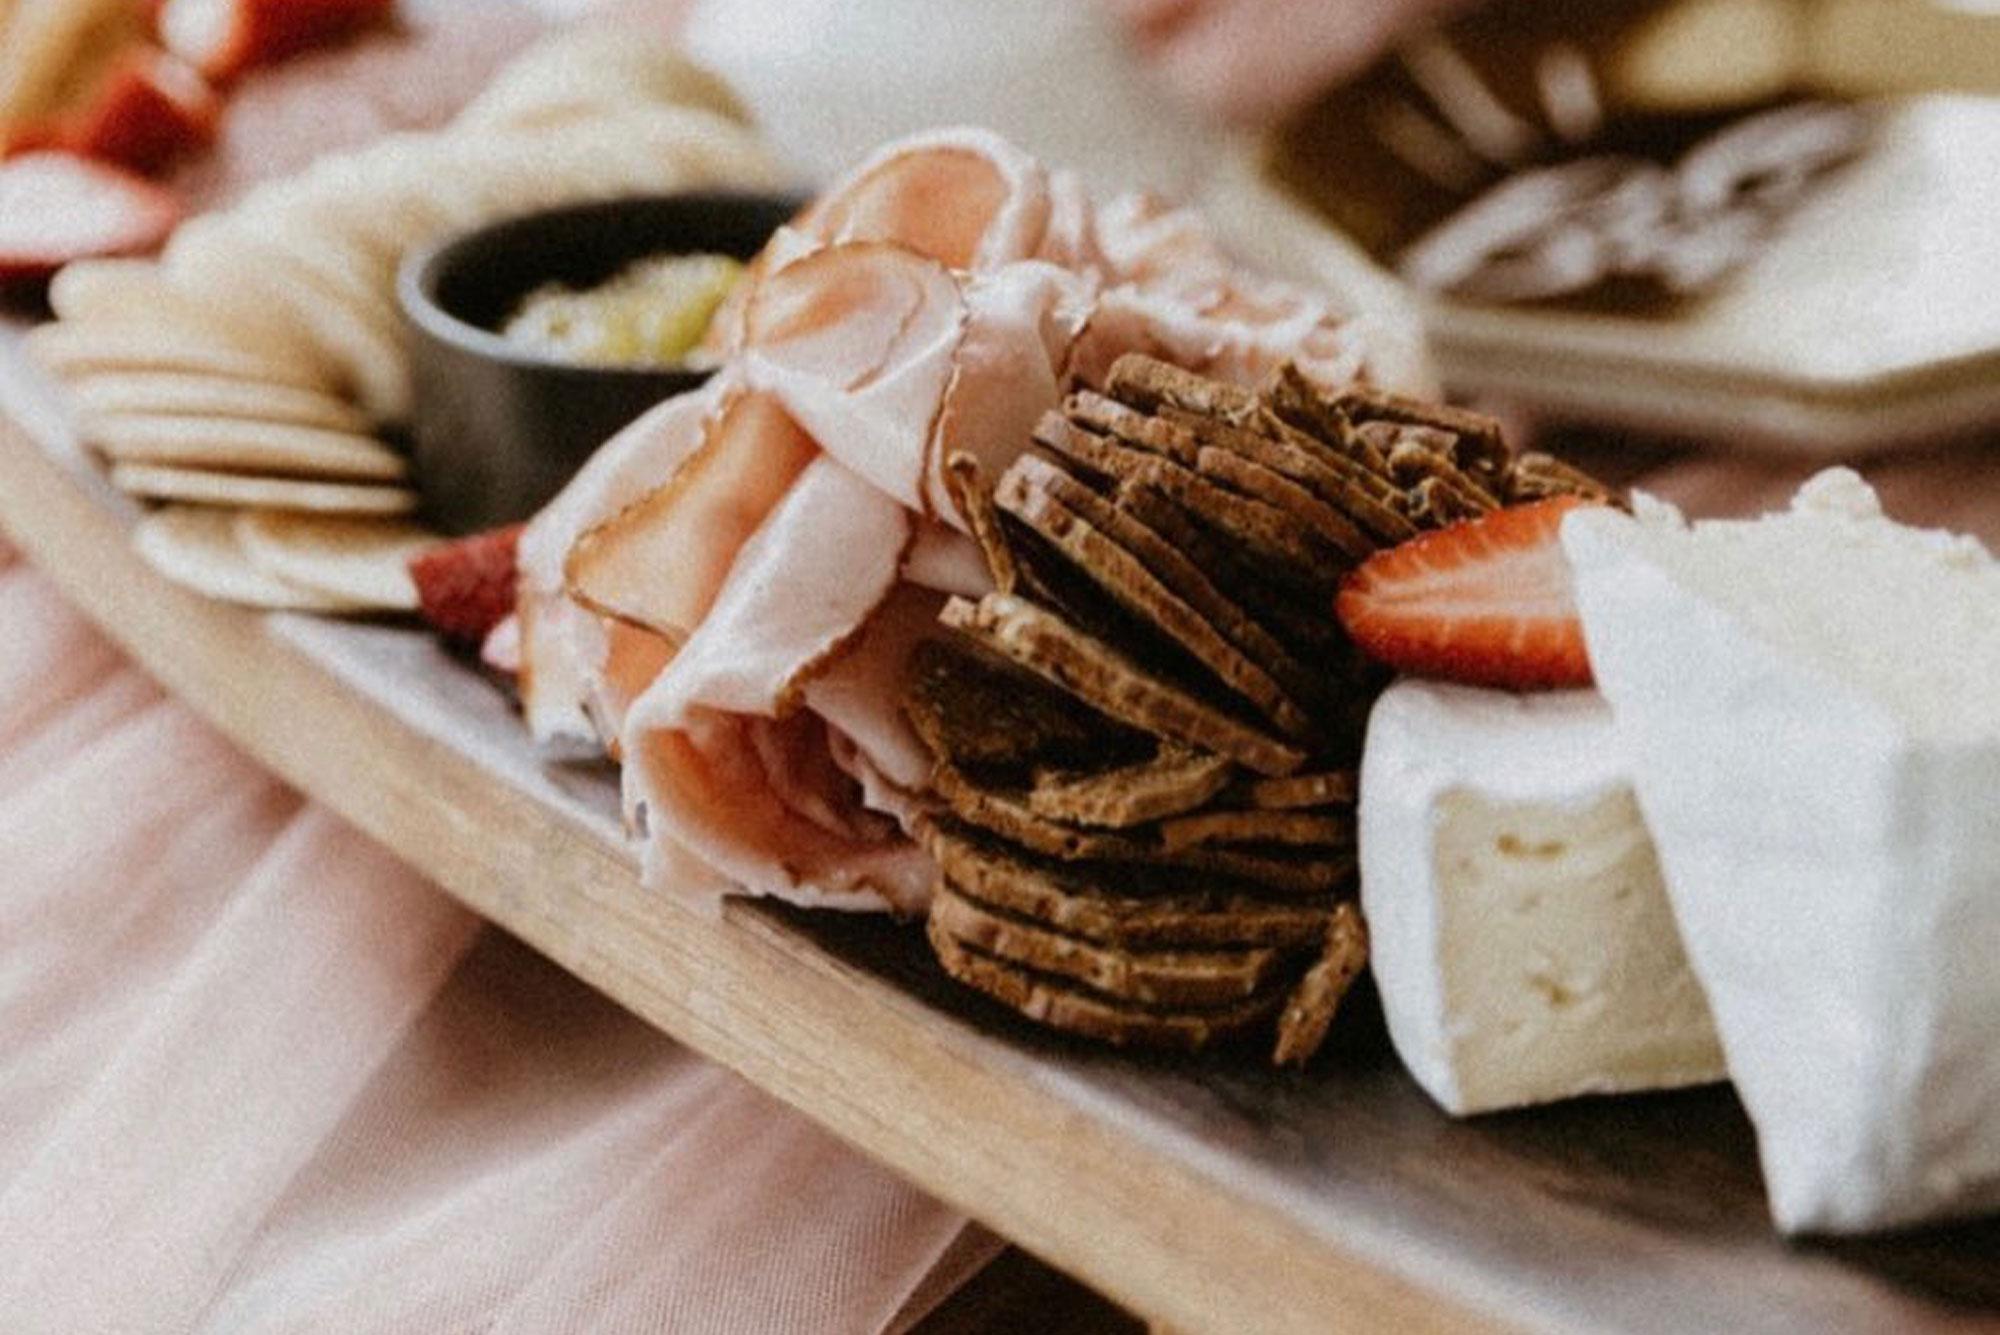 The-Sundae-Agency-Blog-Cheese-Board-from-winestainbarossa2